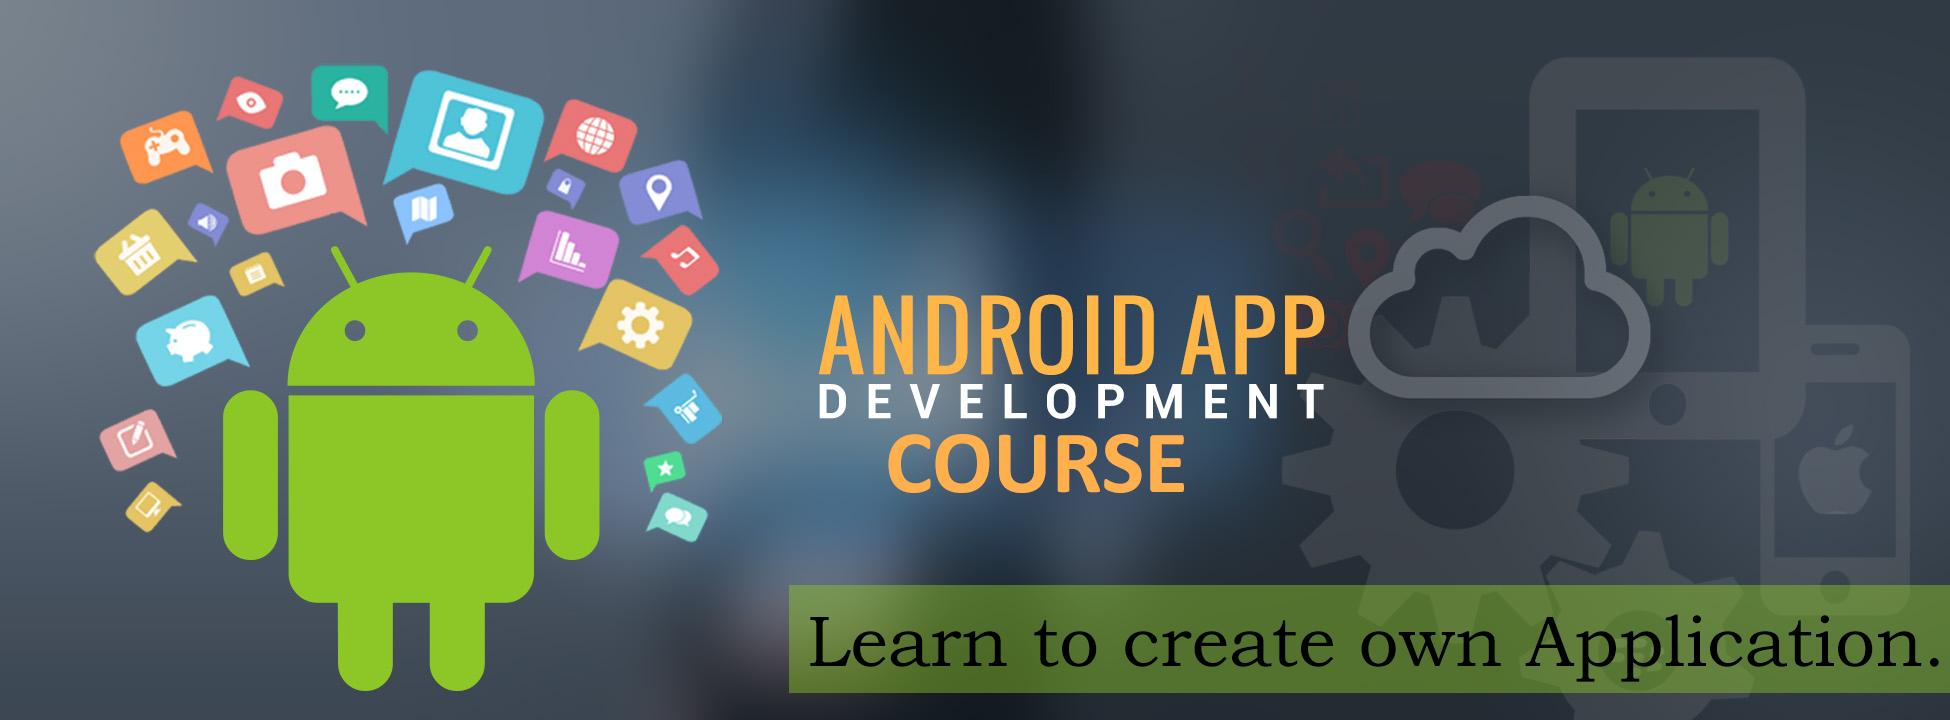 Android Development Training at NexgenInfotech Academy